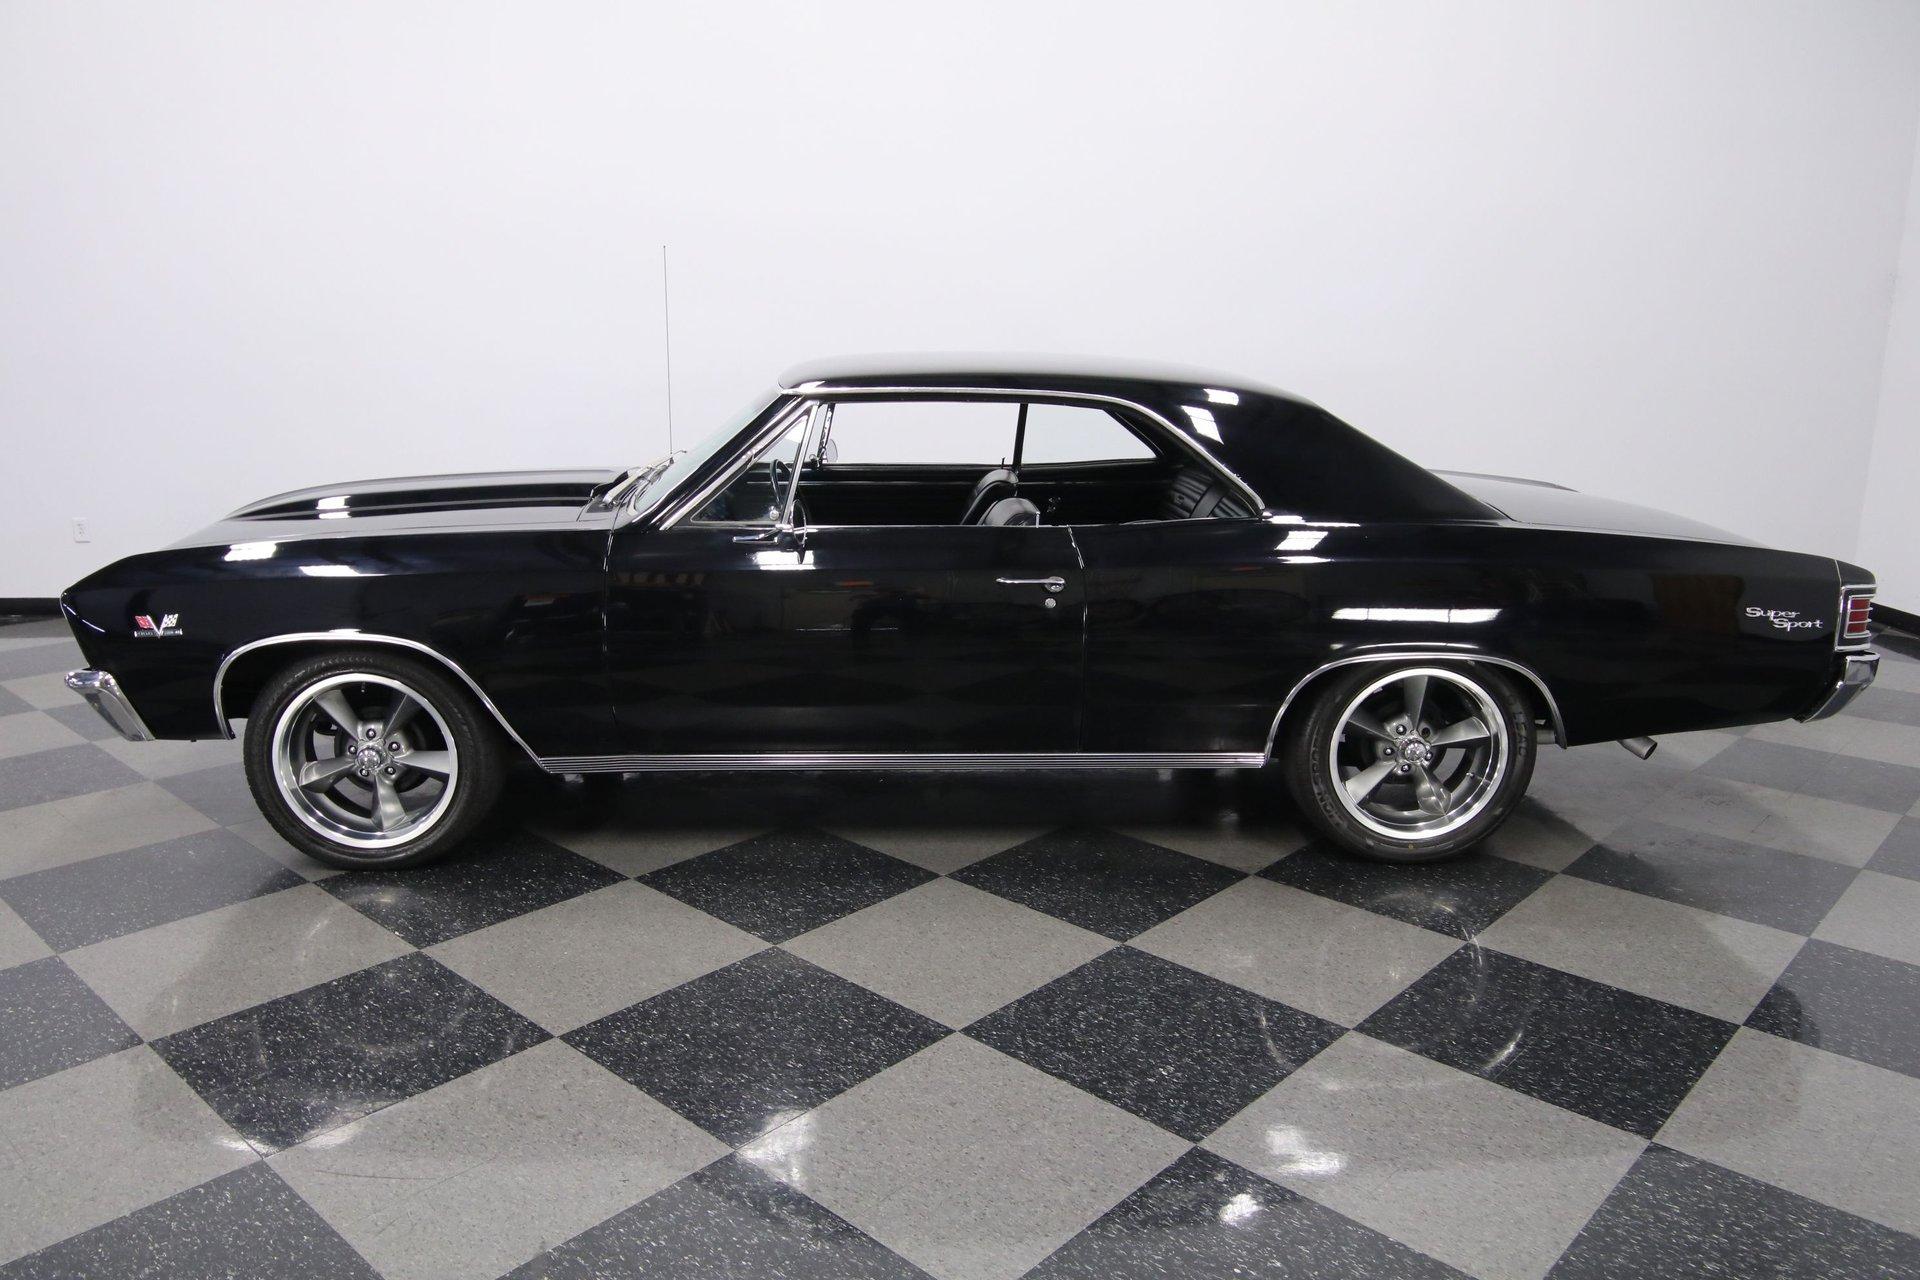 1967 chevrolet chevelle ss 396 tribute